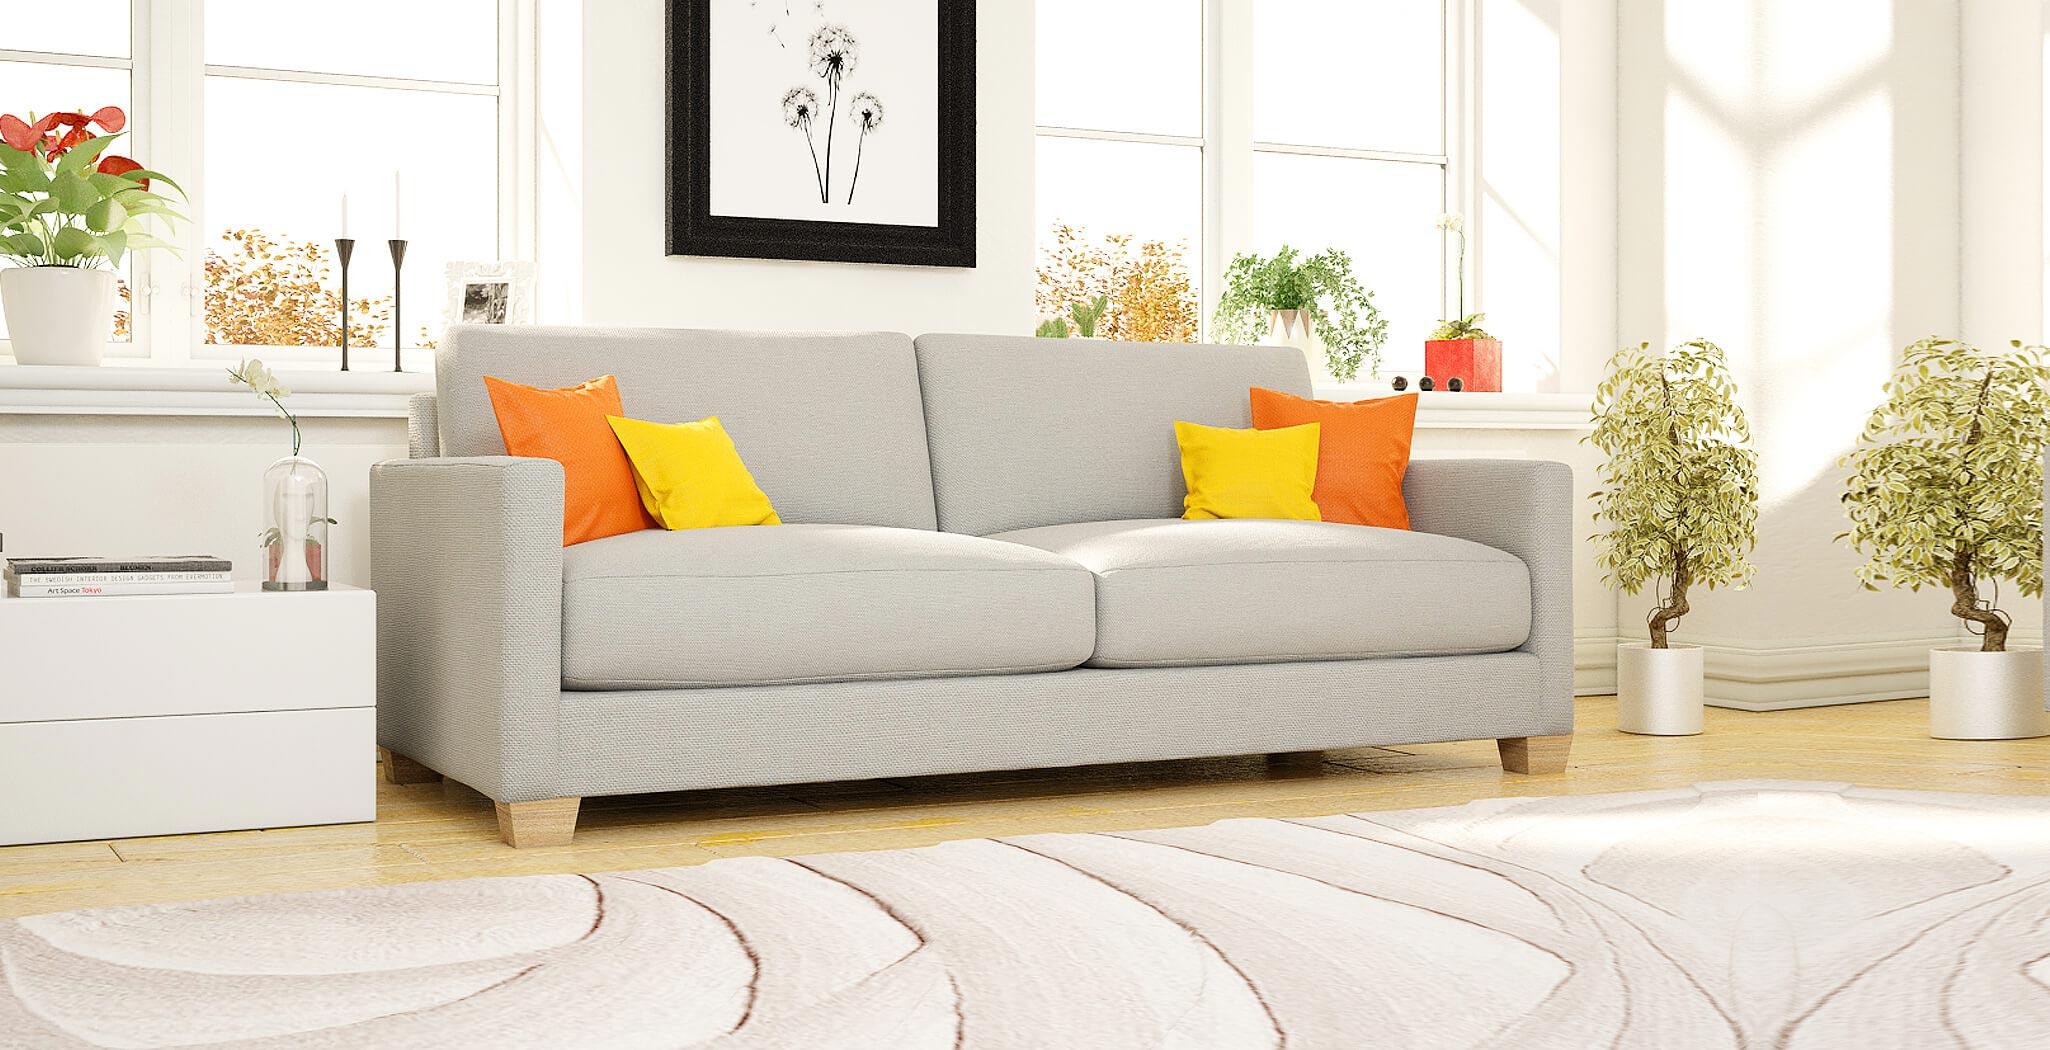 dresden sofa furniture gallery 2